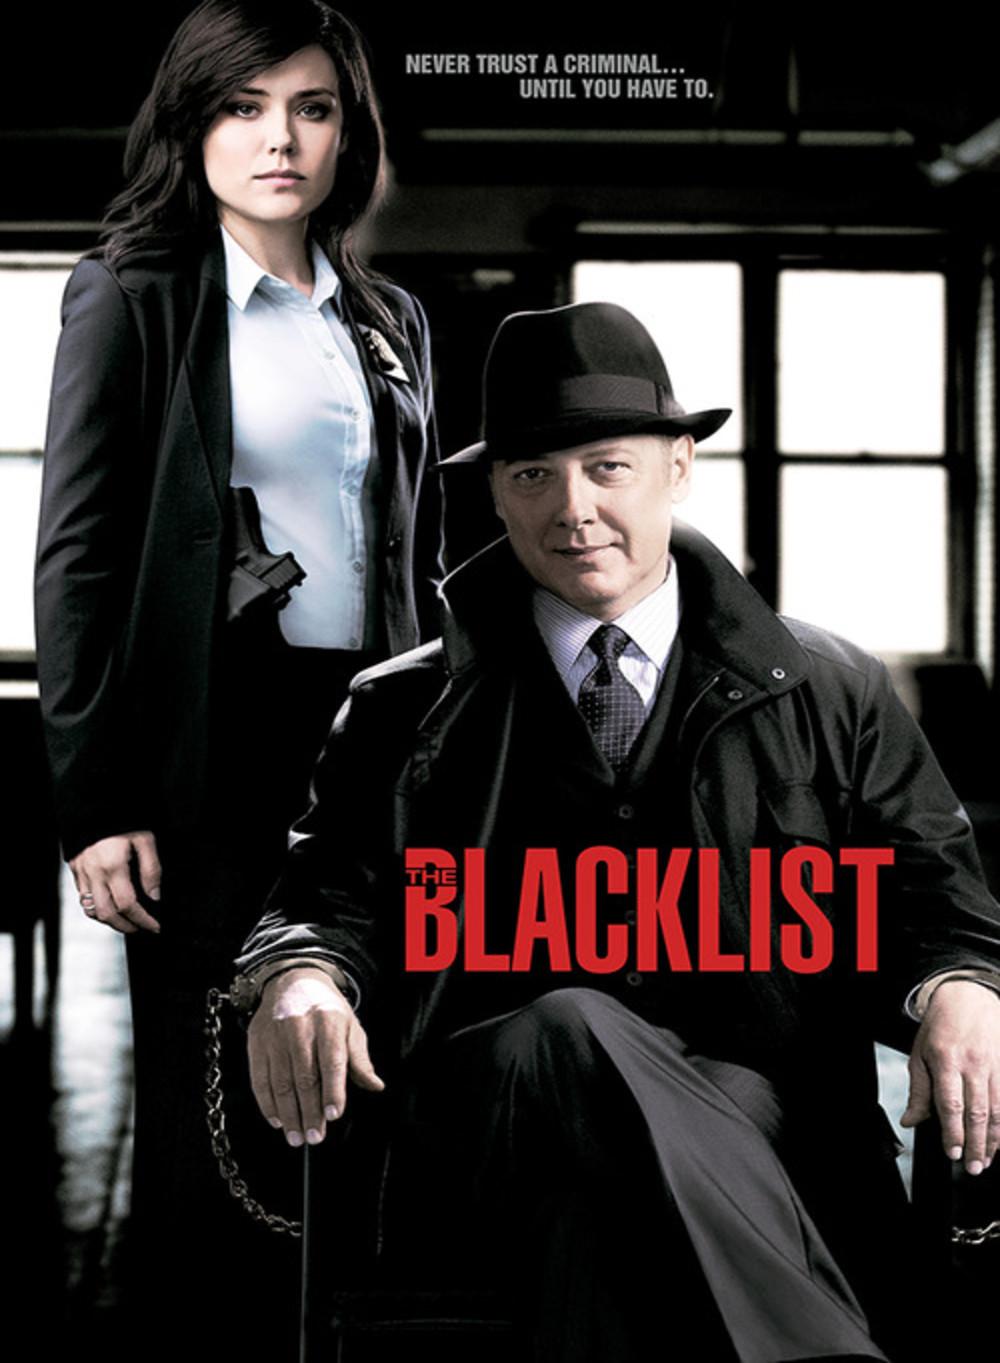 http://2.bp.blogspot.com/-713KSU_NLxA/VmbprDAaPZI/AAAAAAAAK-c/395xDFDpj3Q/s1600/the-blacklist.jpg